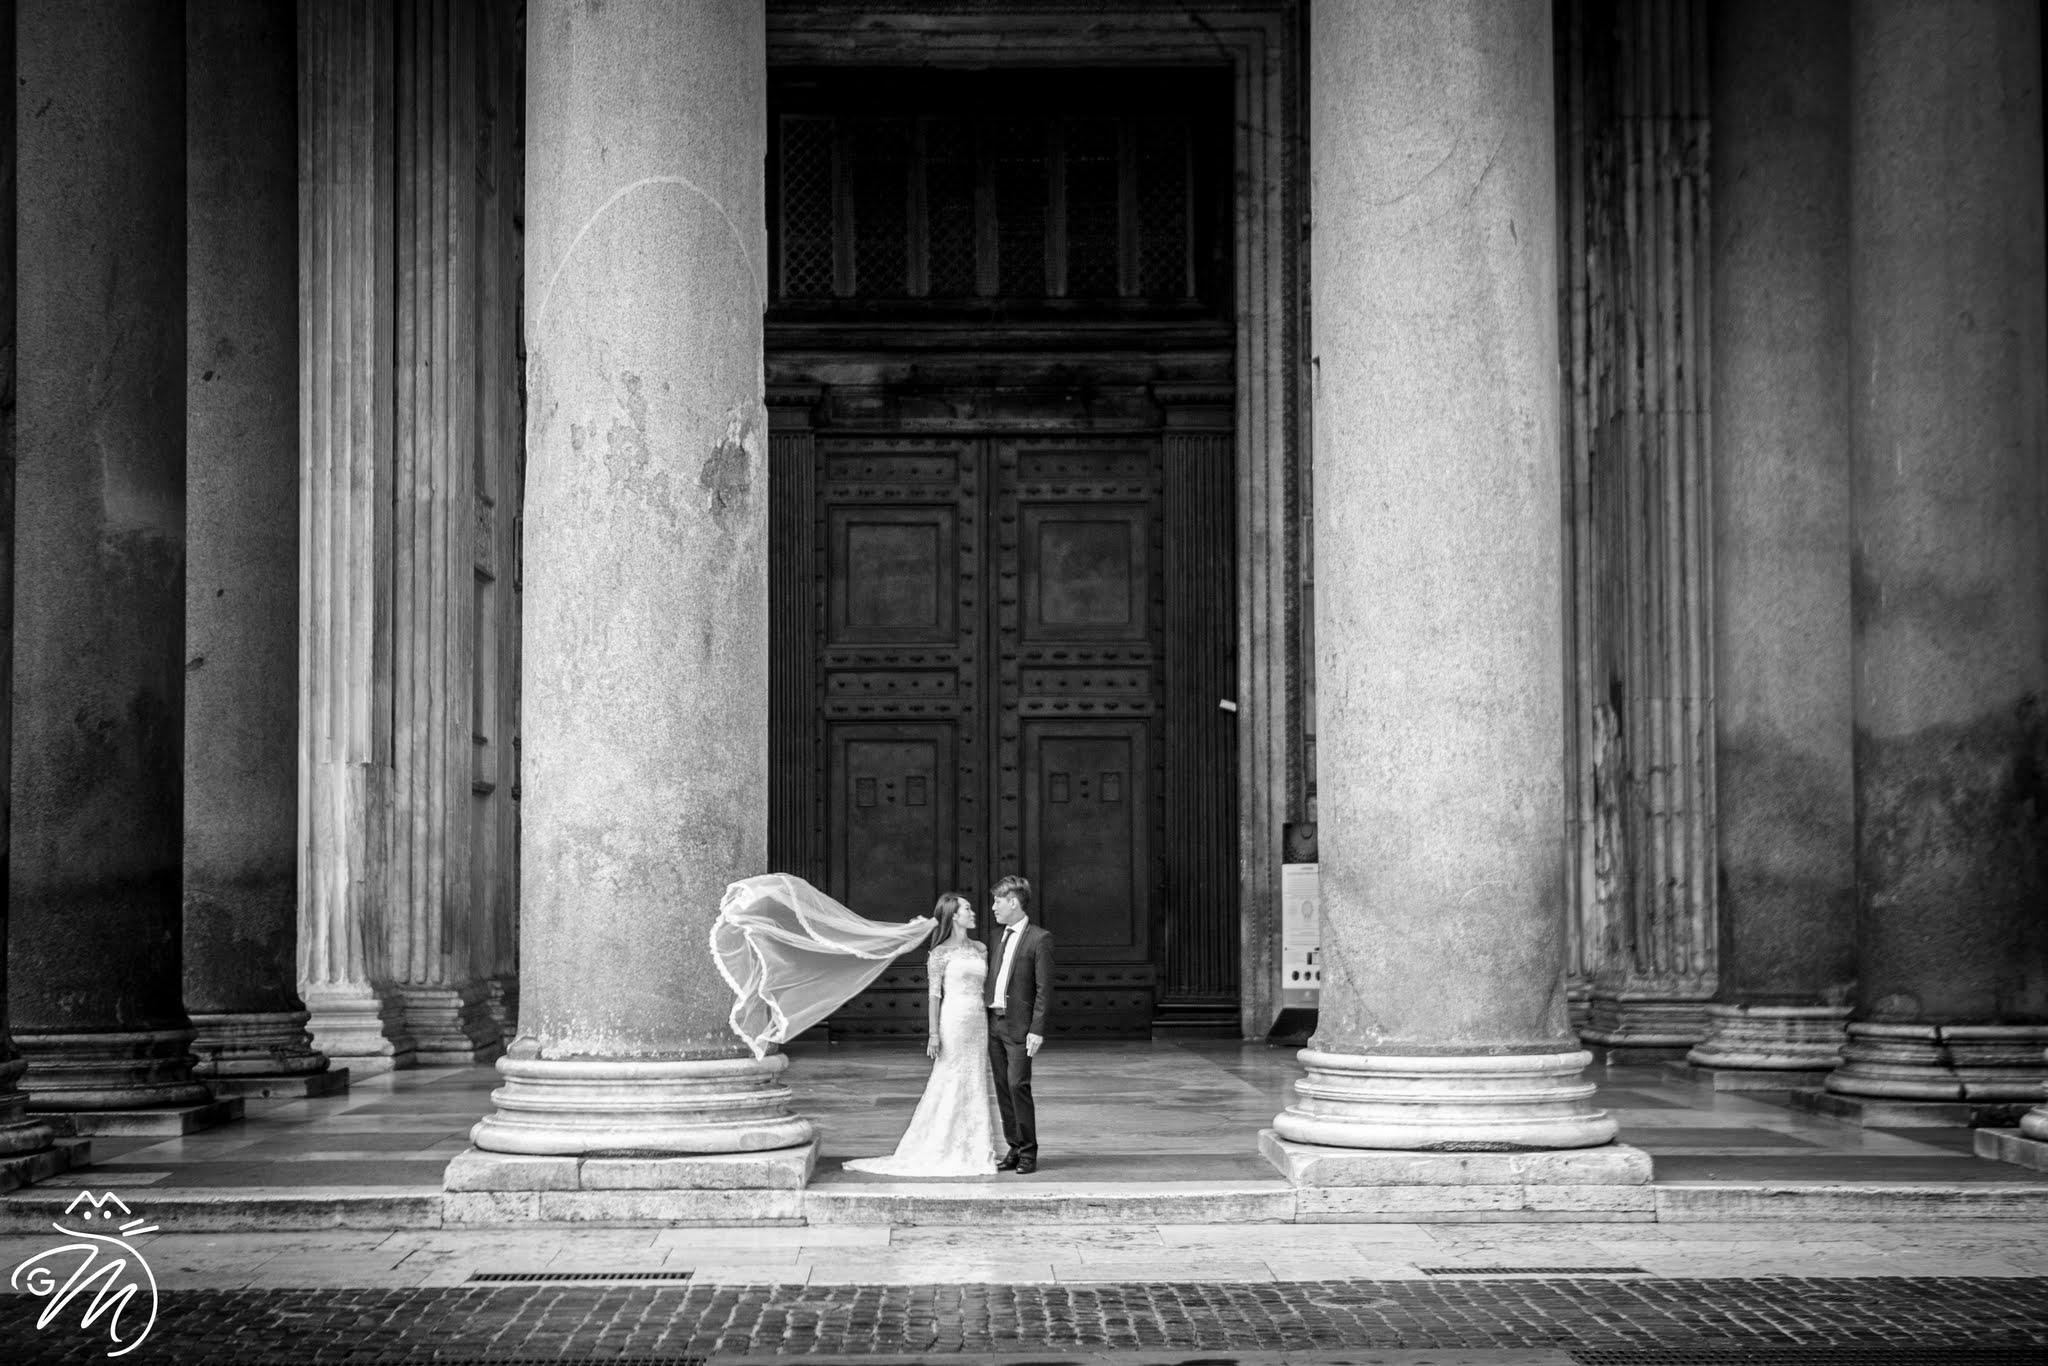 fotografo matrimonio Roma photographer in Italy ORIZZONTALI2_LOGO_HOME_PAGE_INTERNATIONAL_PHOTOGRAPHER_IN_ROME_WEDDING_DESTINATION_GIROLAMO_MONTELEONE_-79